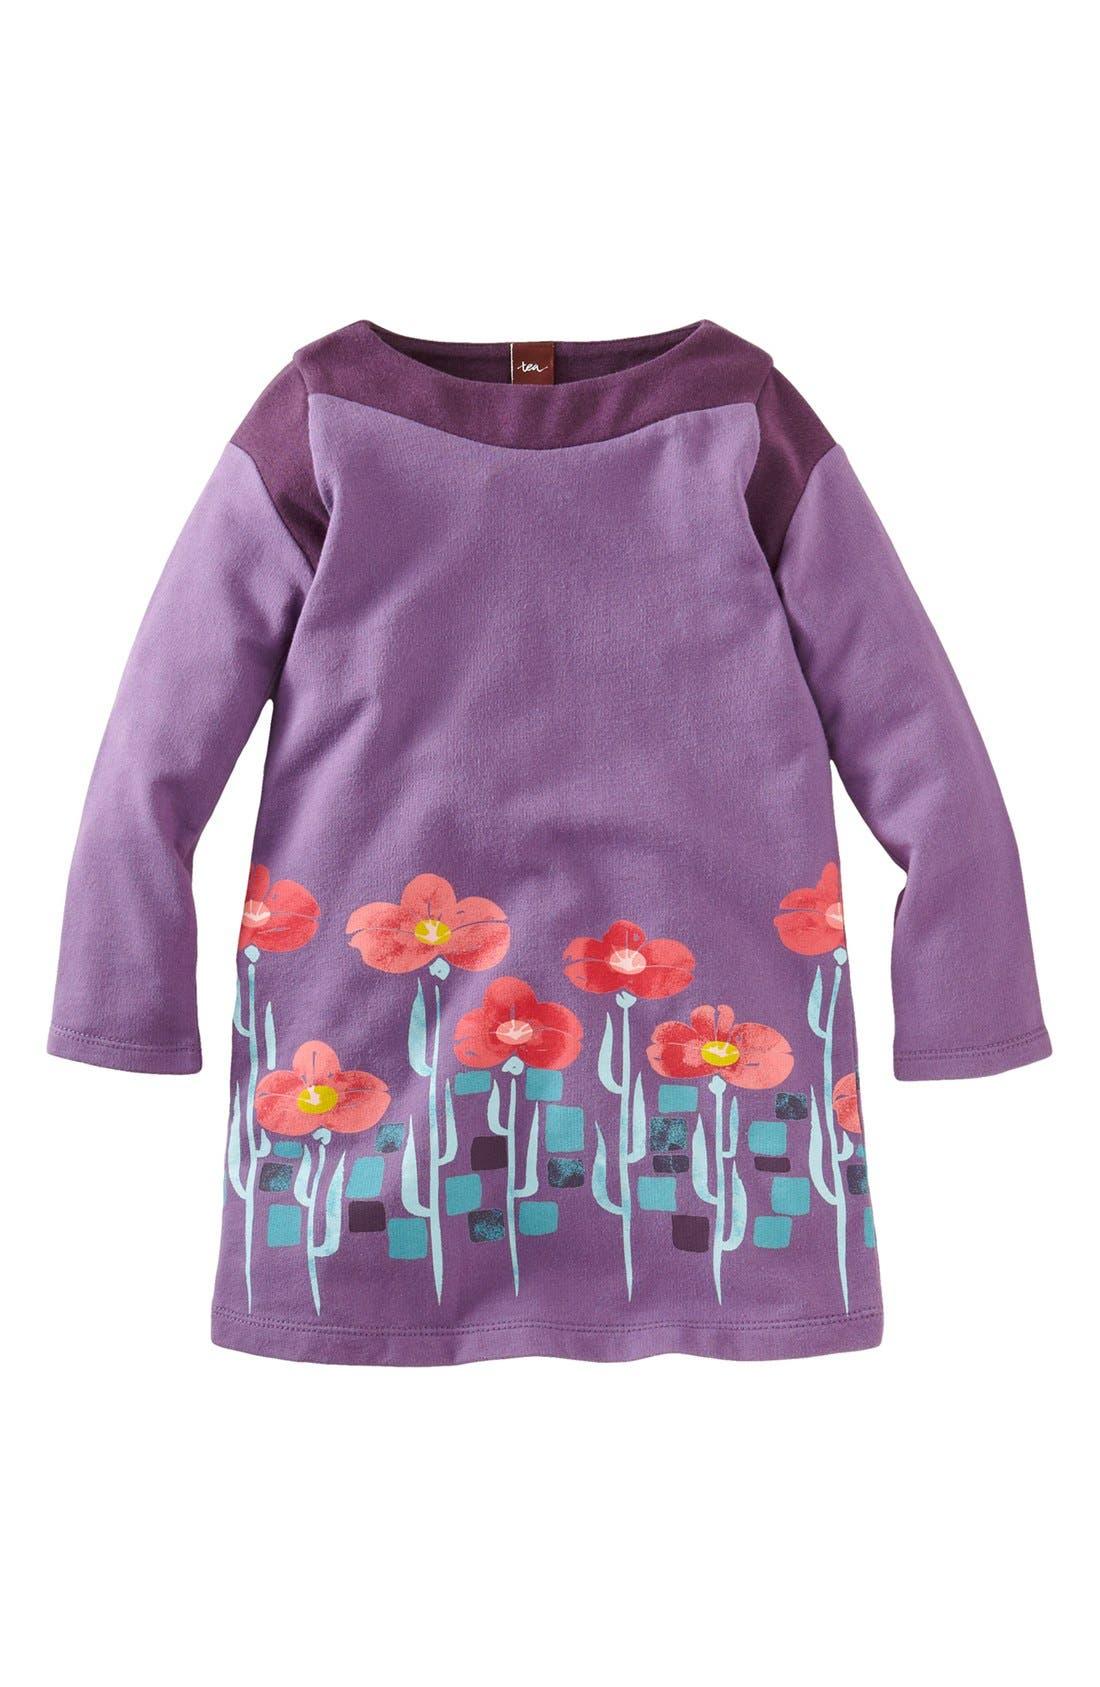 Main Image - Tea Collection 'Botanical Gardens' Dress (Little Girls & Big Girls)